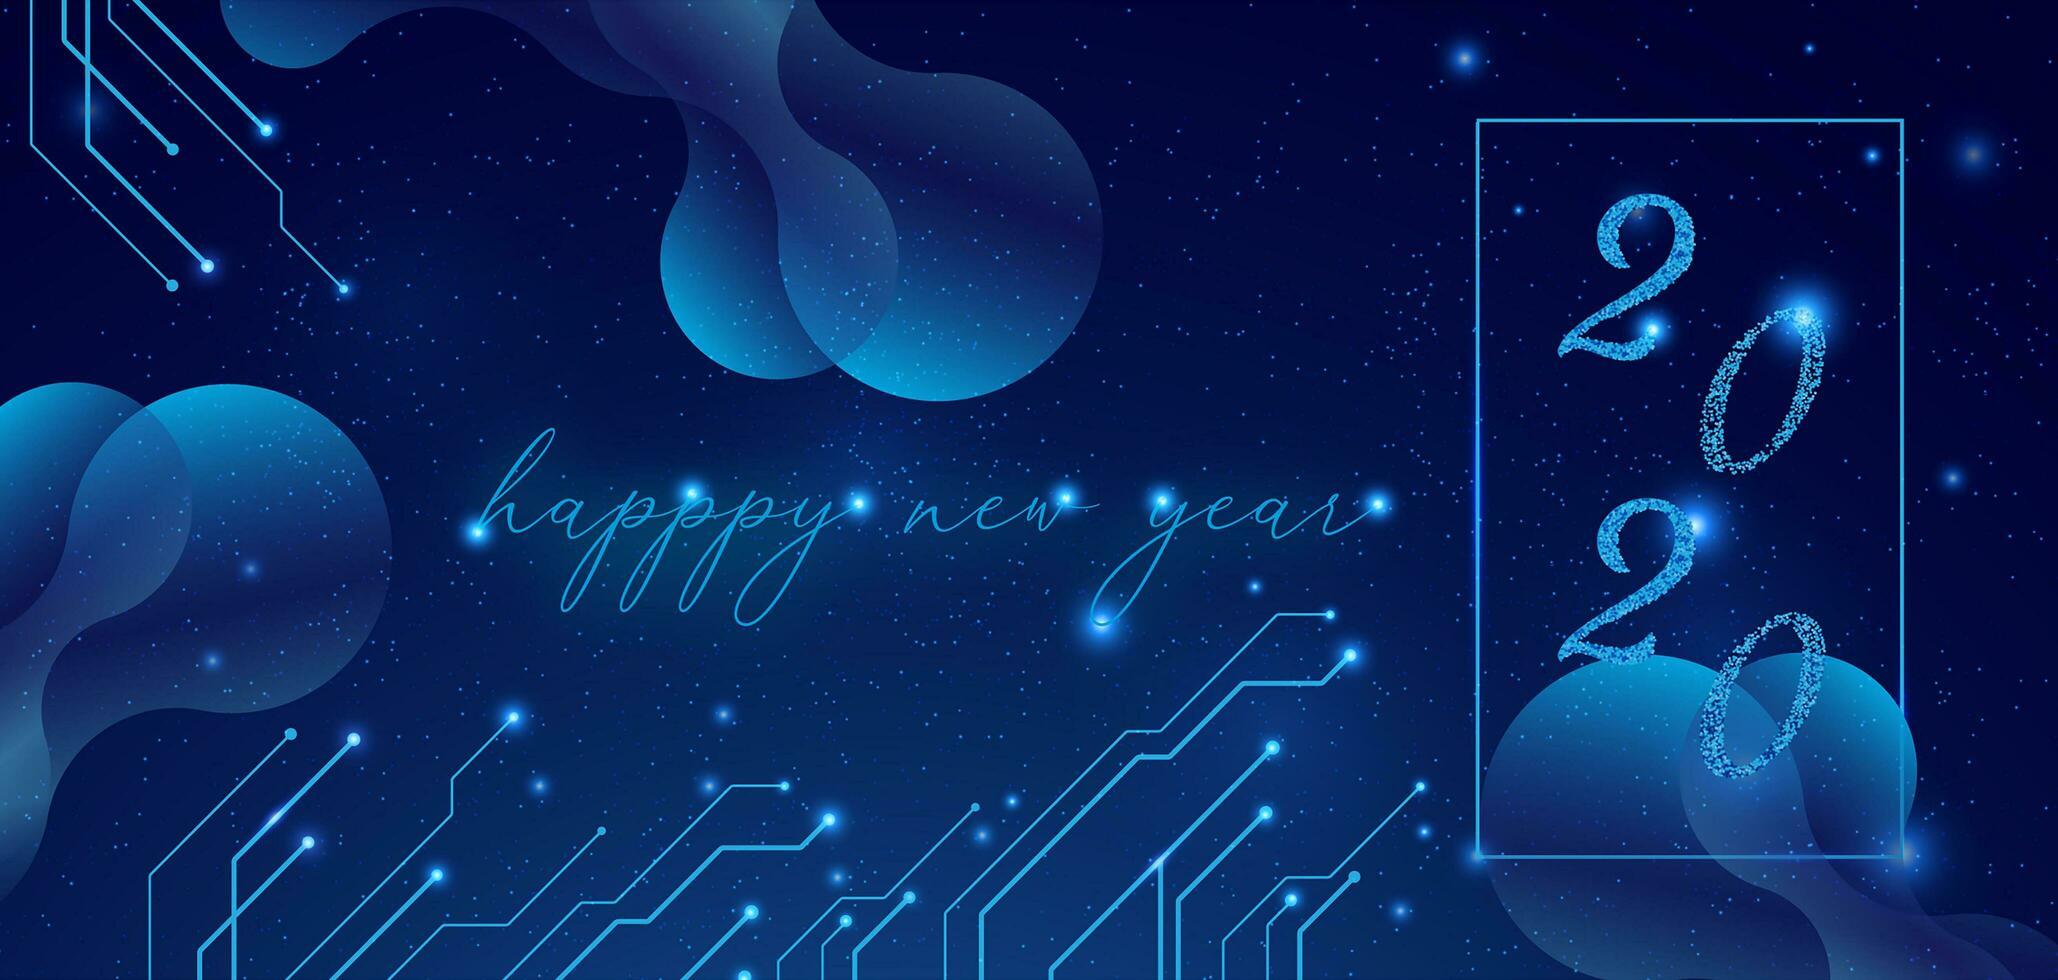 Elegant happy new year 2020